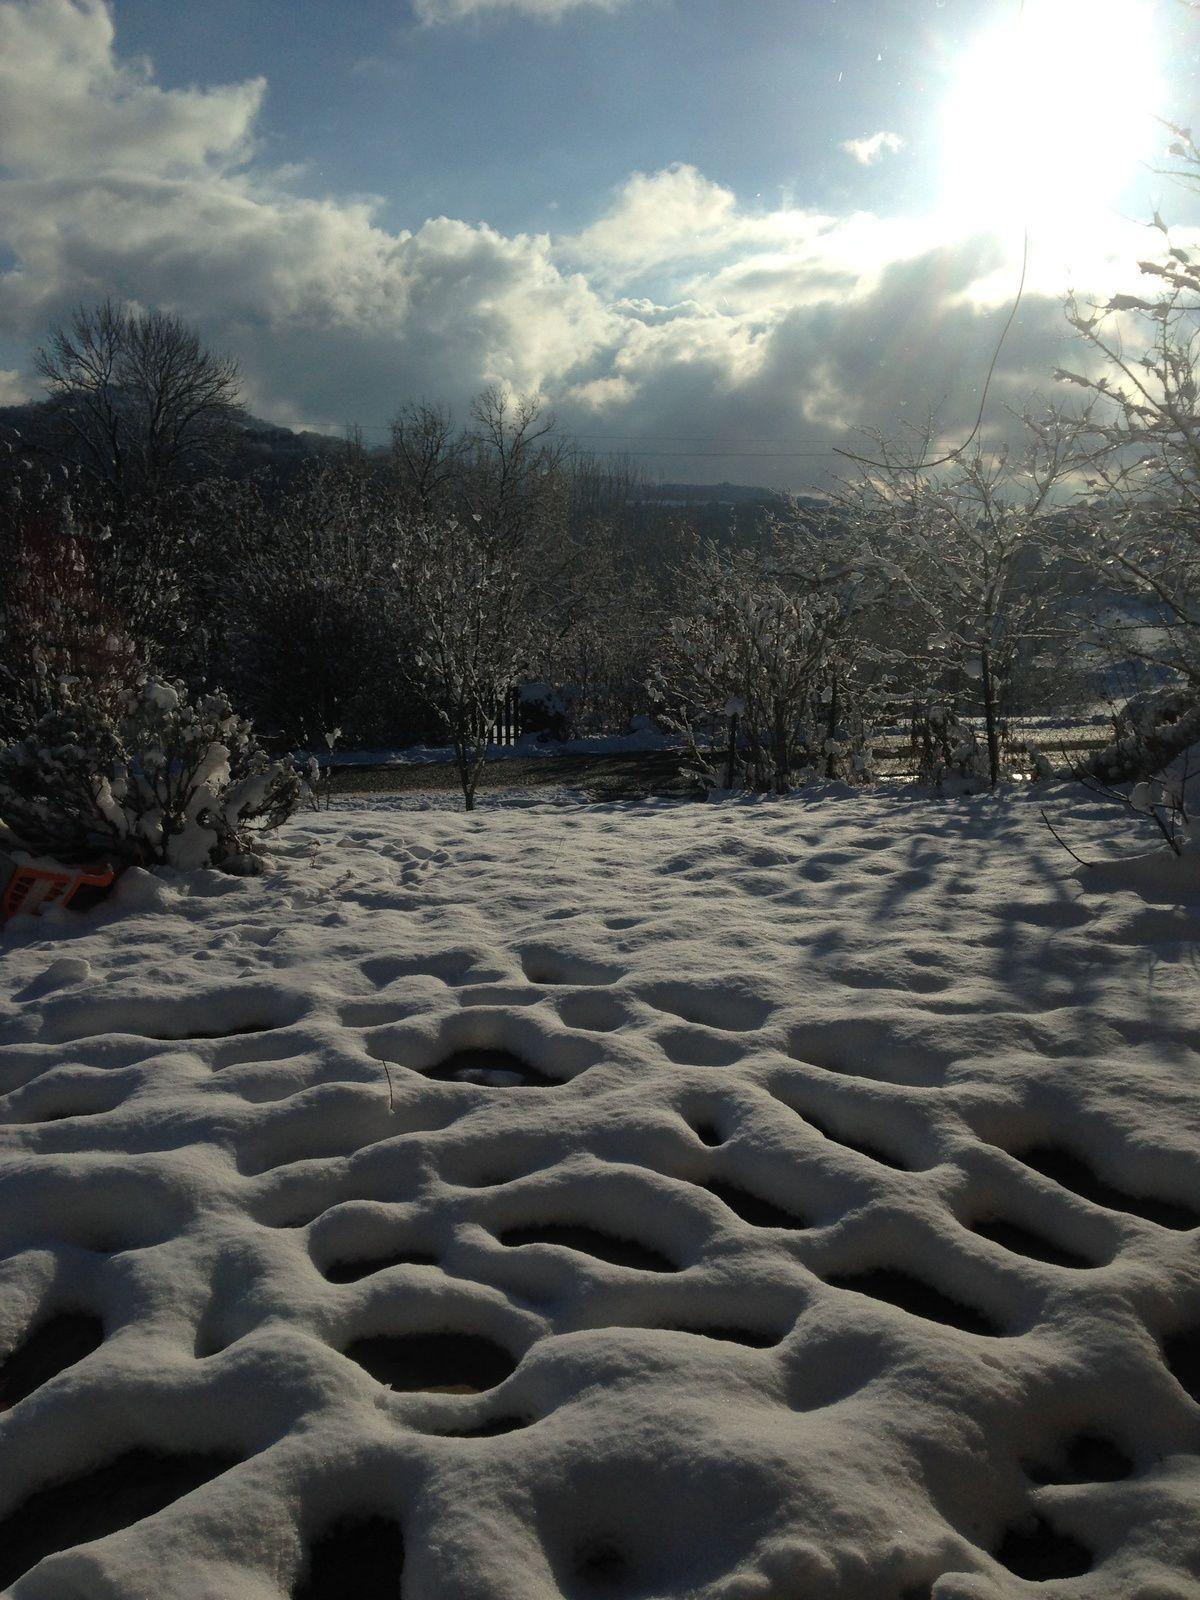 #egliseneuve-pres-billom #neige #auvergne #france #charlotteblabla